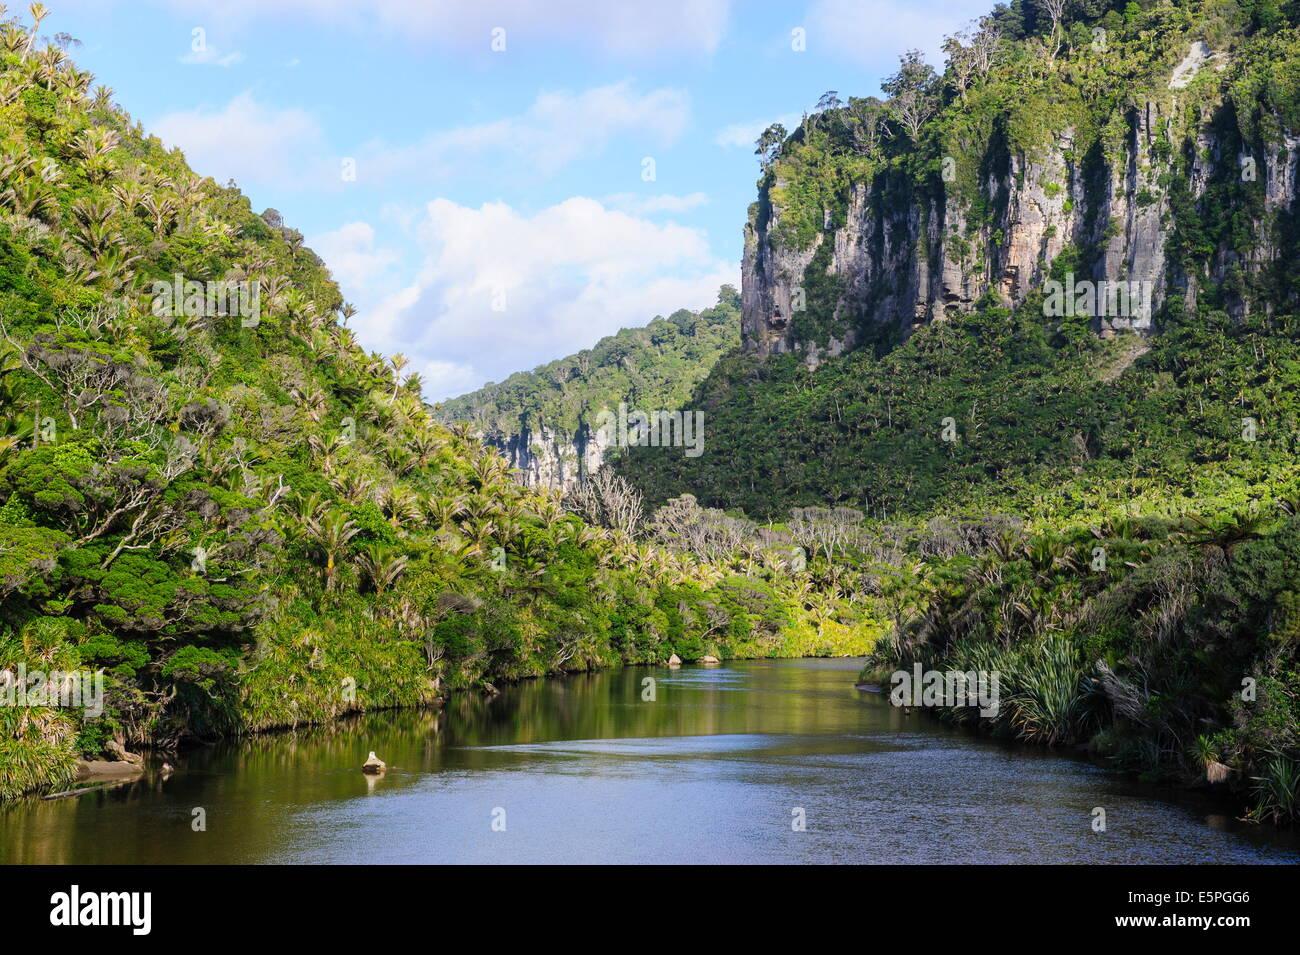 Üppige Vegetation und Klippen, Porari Fluss, Paparoa National Park, West Coast, Südinsel, Neuseeland, Stockbild